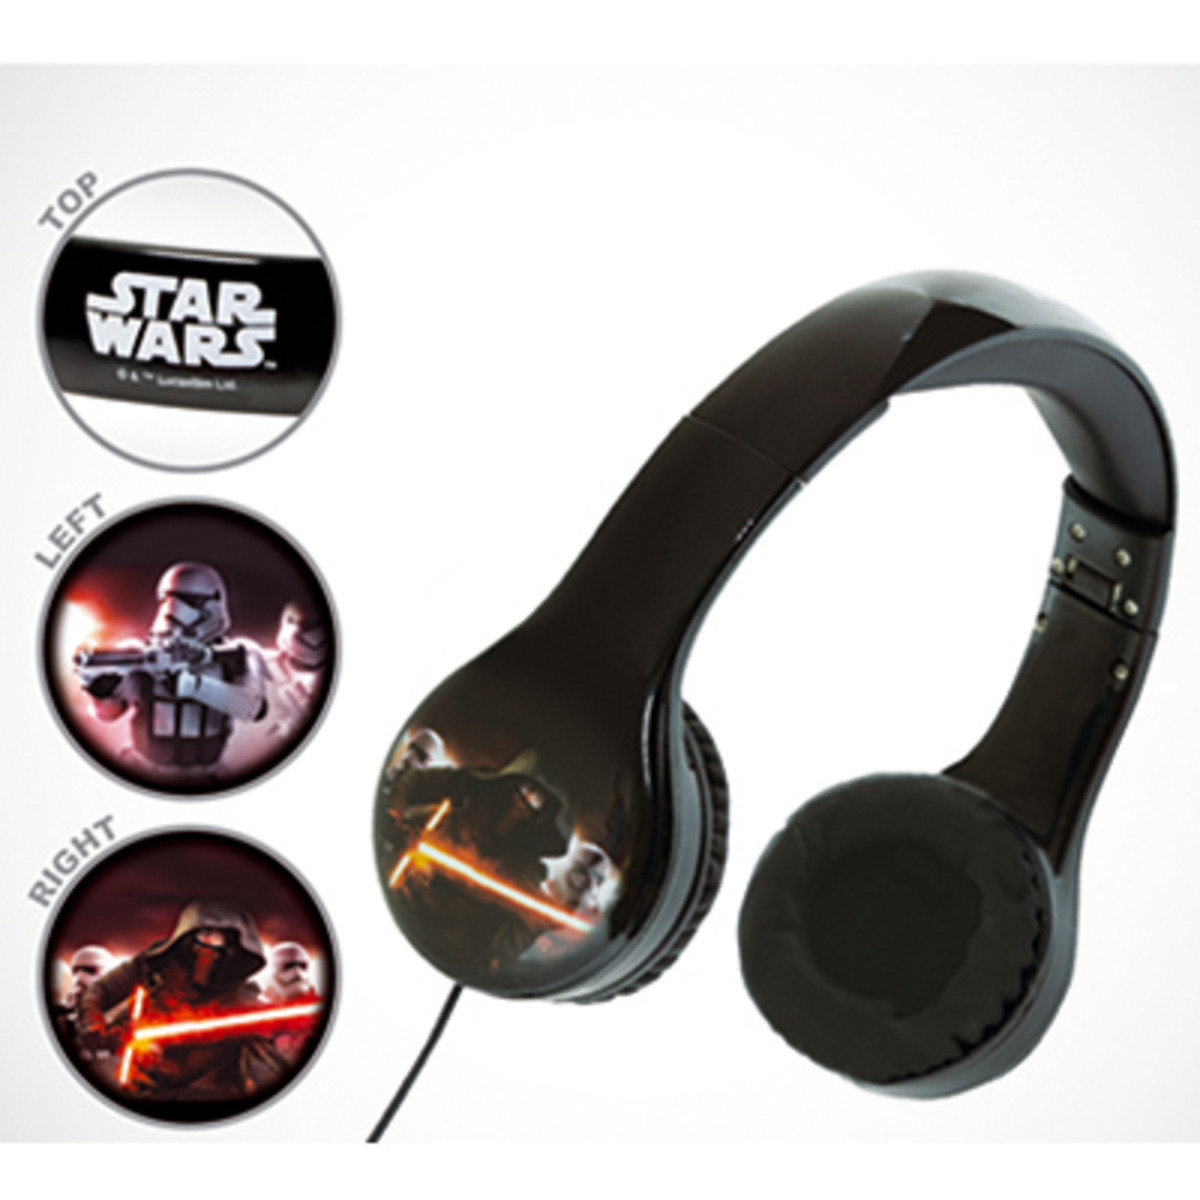 Star Wars耳機